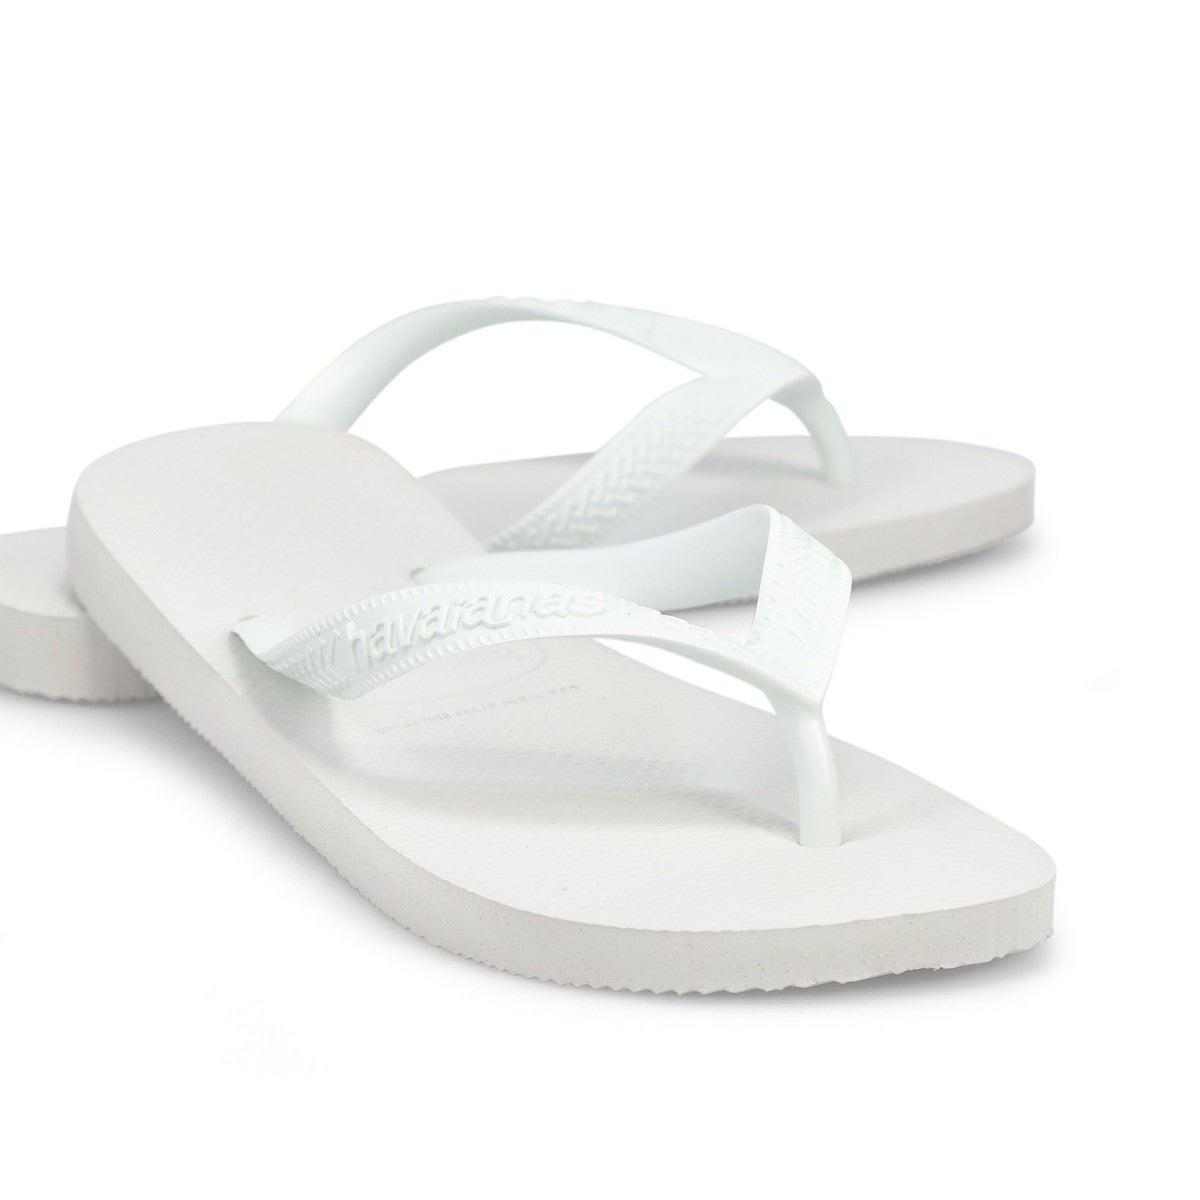 Women's Top Flip Flops - White